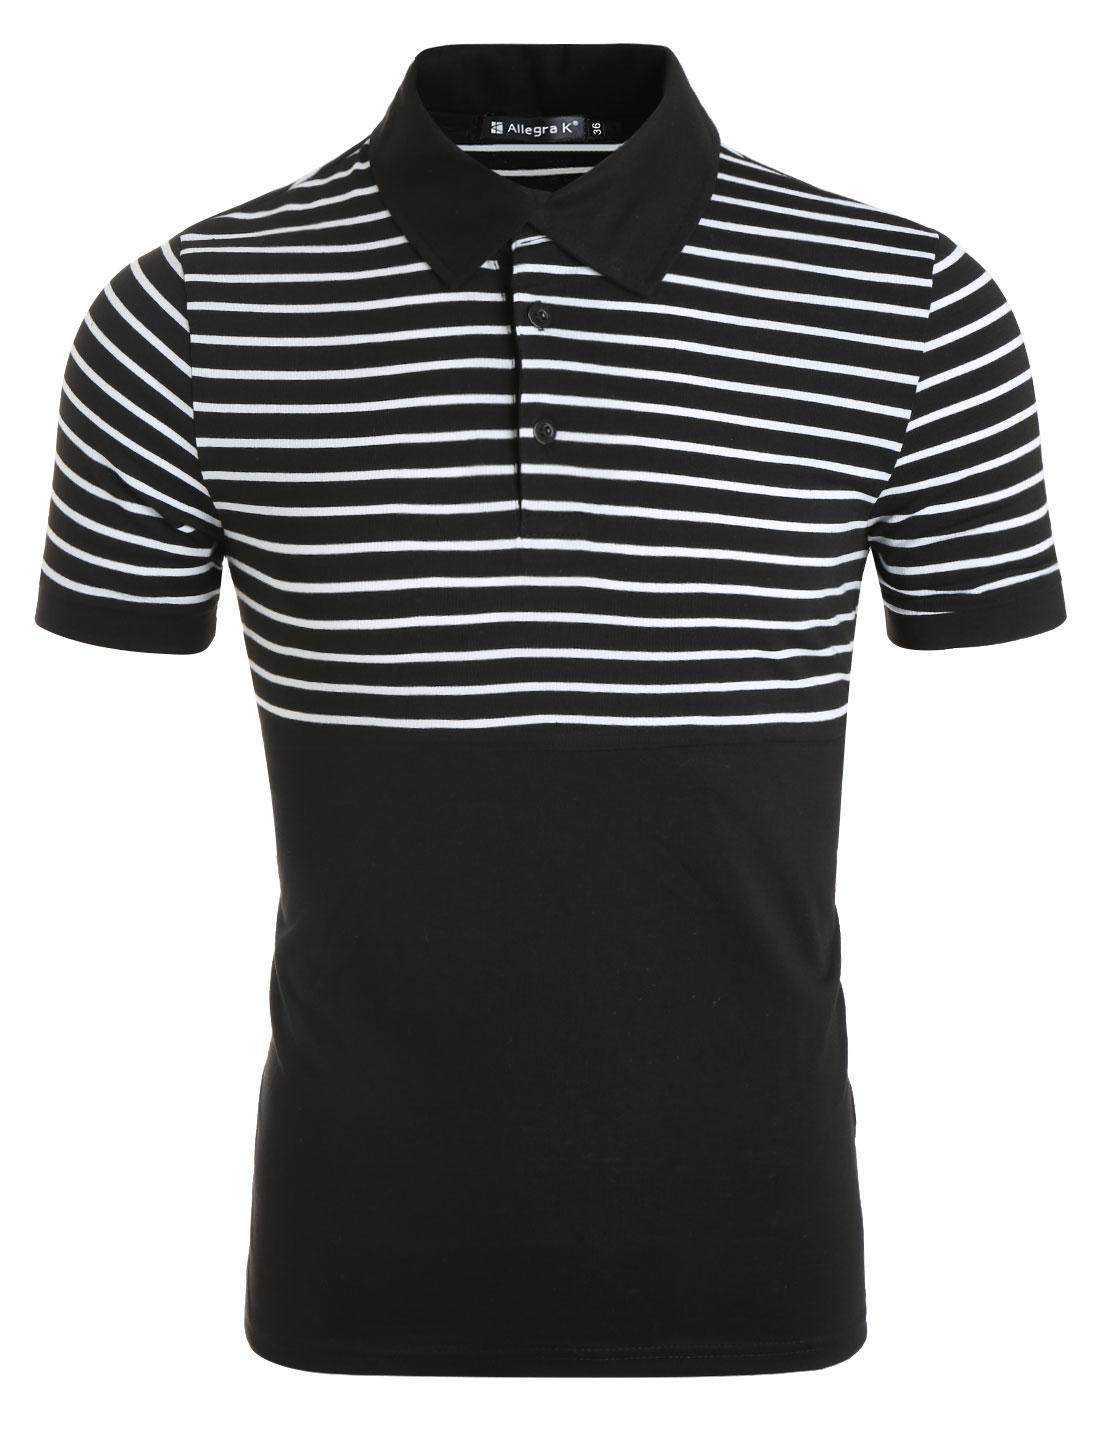 Men Striped Short Sleeves Three-Button Placket Polo Shirt Black L